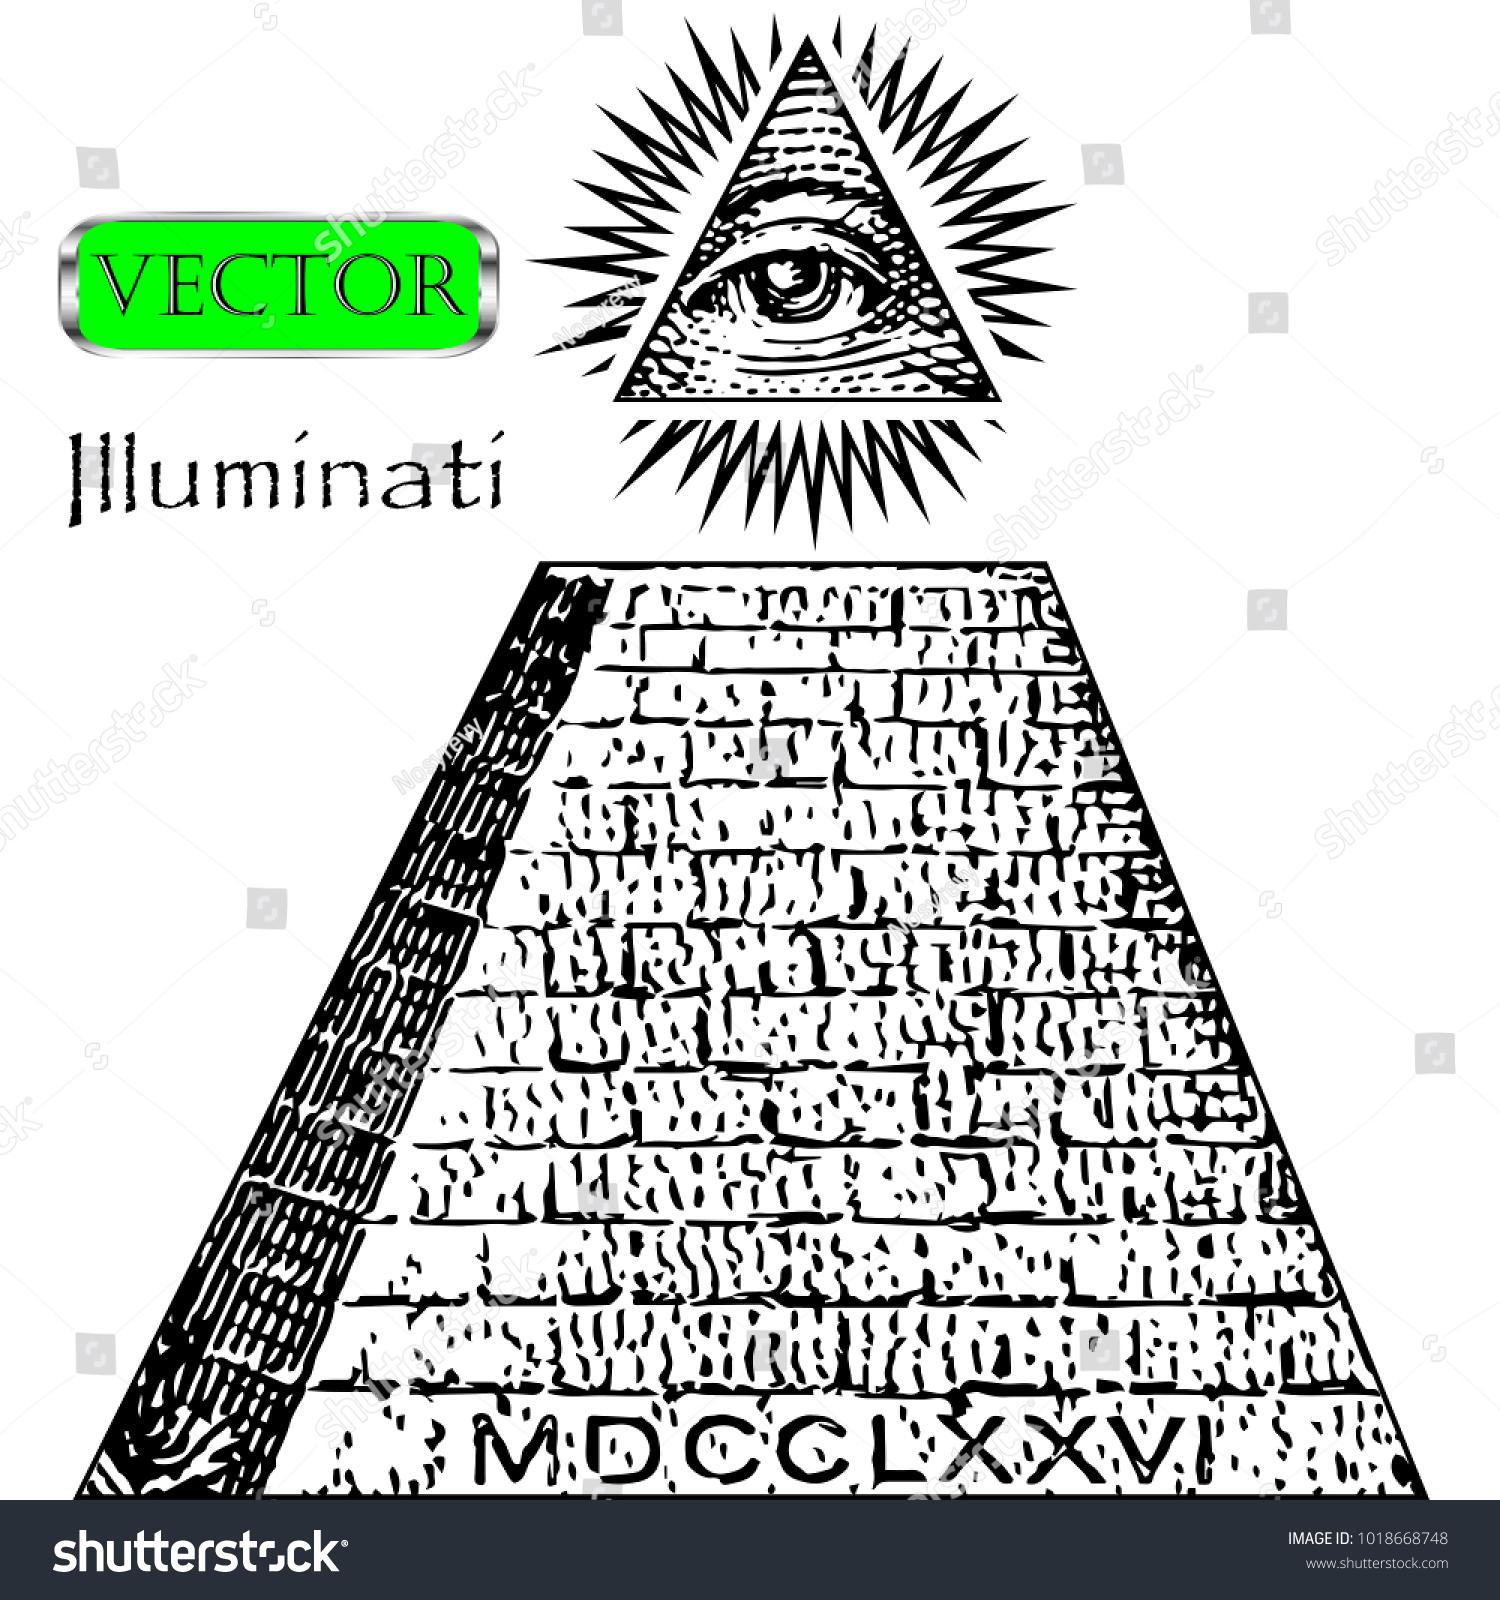 One Dollar Pyramid New World Order Stock Vector HD (Royalty Free ...